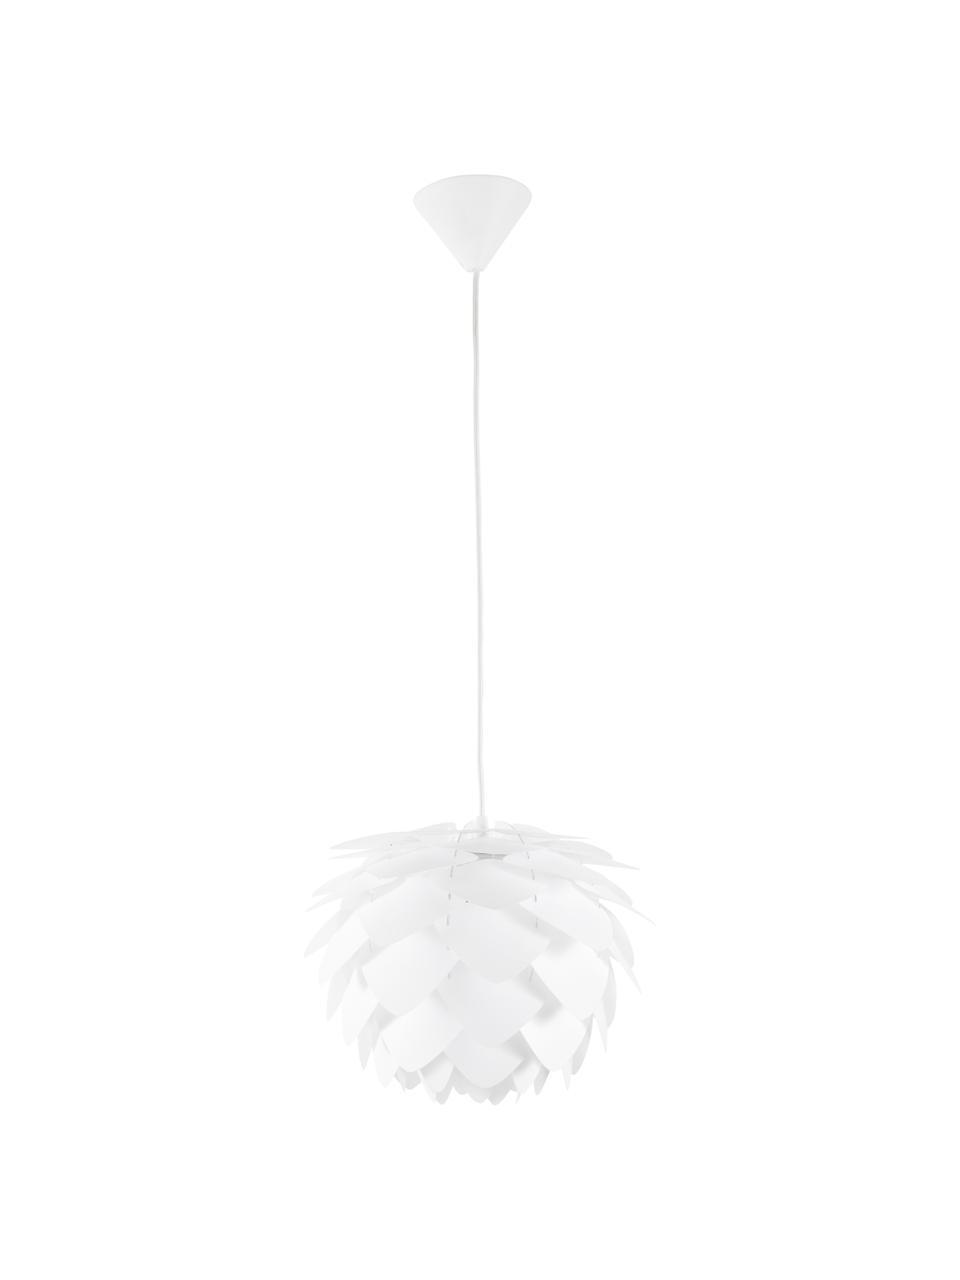 Lampada a sospensione Silvia, Paralume: polipropilene, Baldacchino: materiale sintetico, Bianco, Ø 50 x Alt. 41 cm